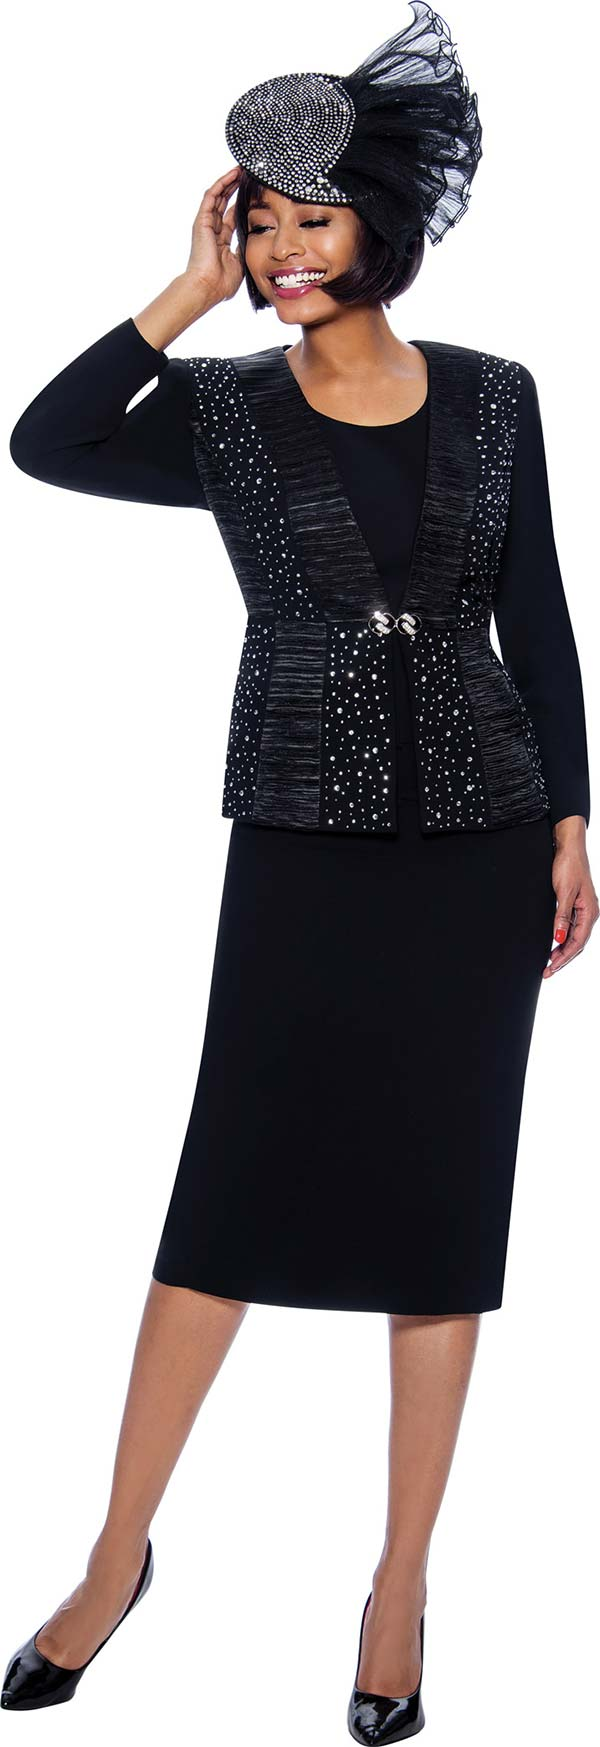 Susanna 3980-Black - Skirt Suit With Rhinestone And Satin Ruffle Detailed Jacket